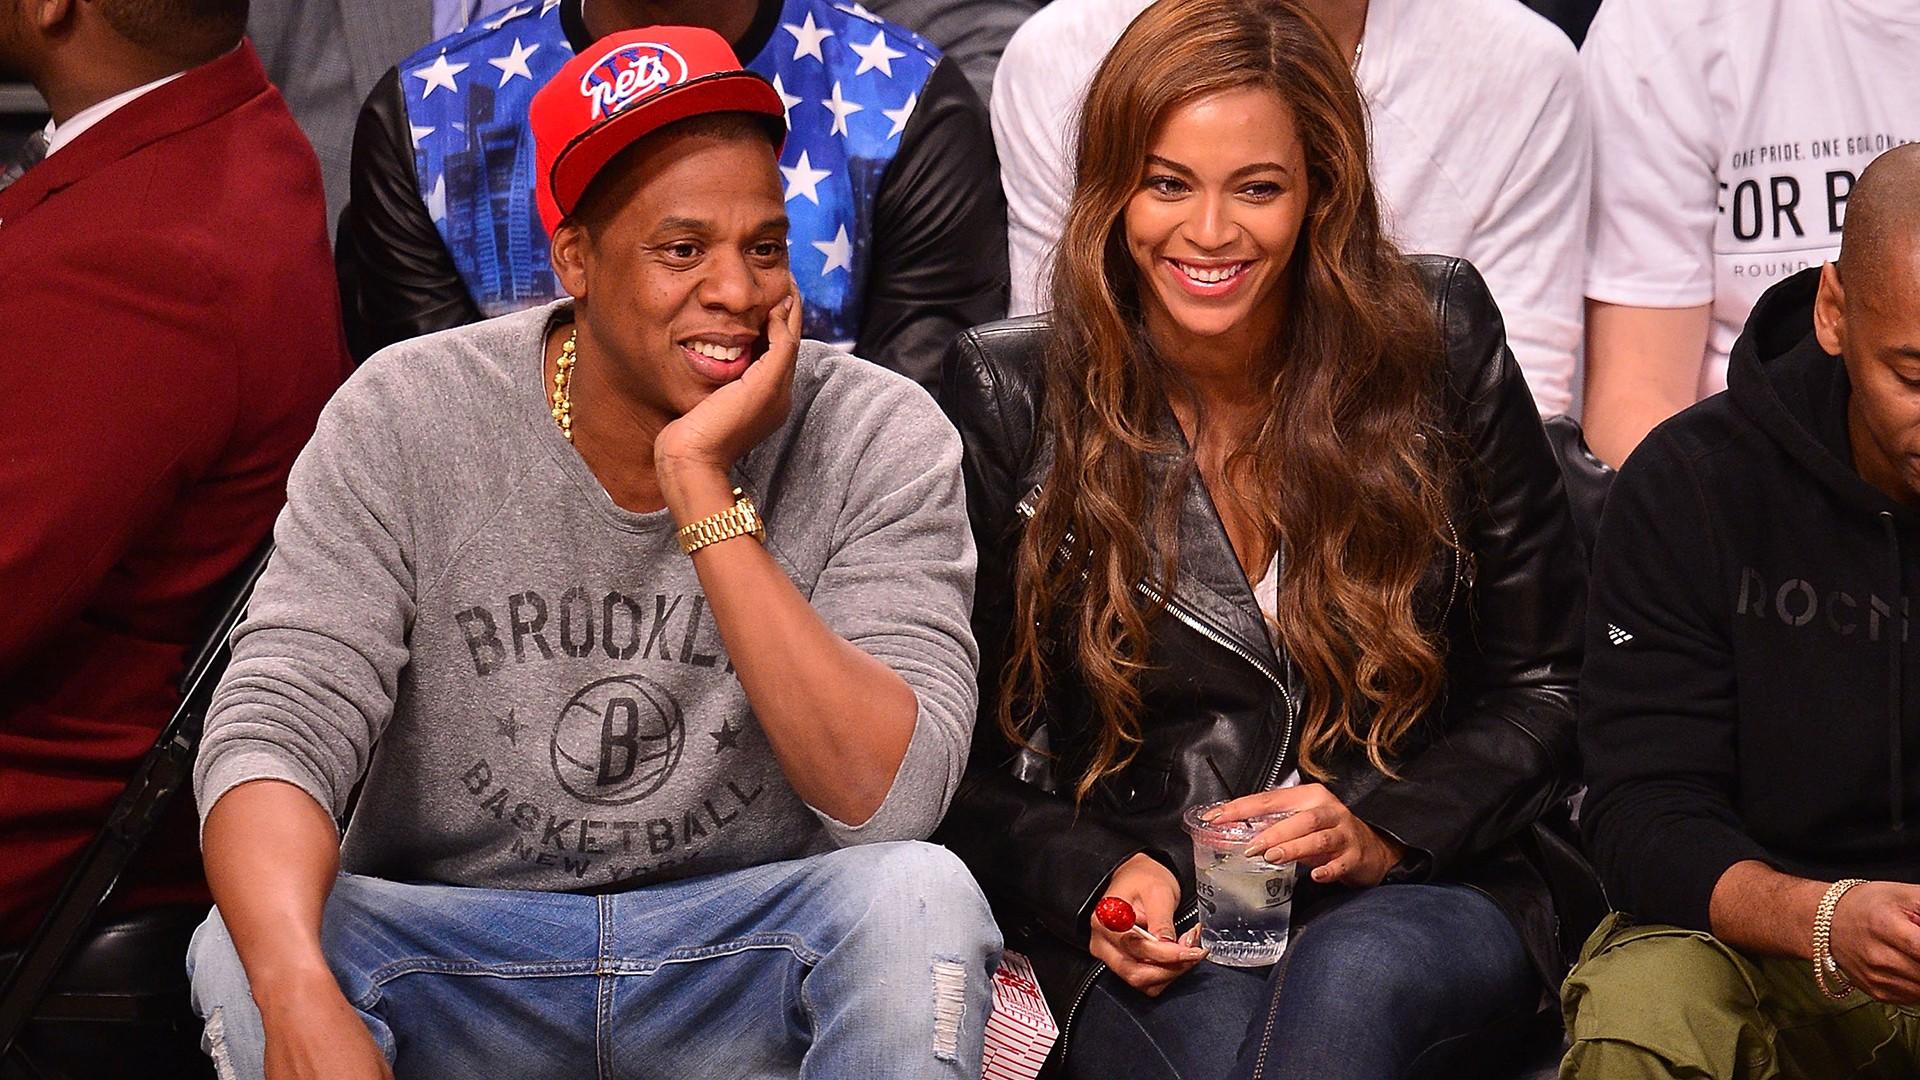 Image: Celebrities Attend The Toronto Raptors Vs Brooklyn Nets Game